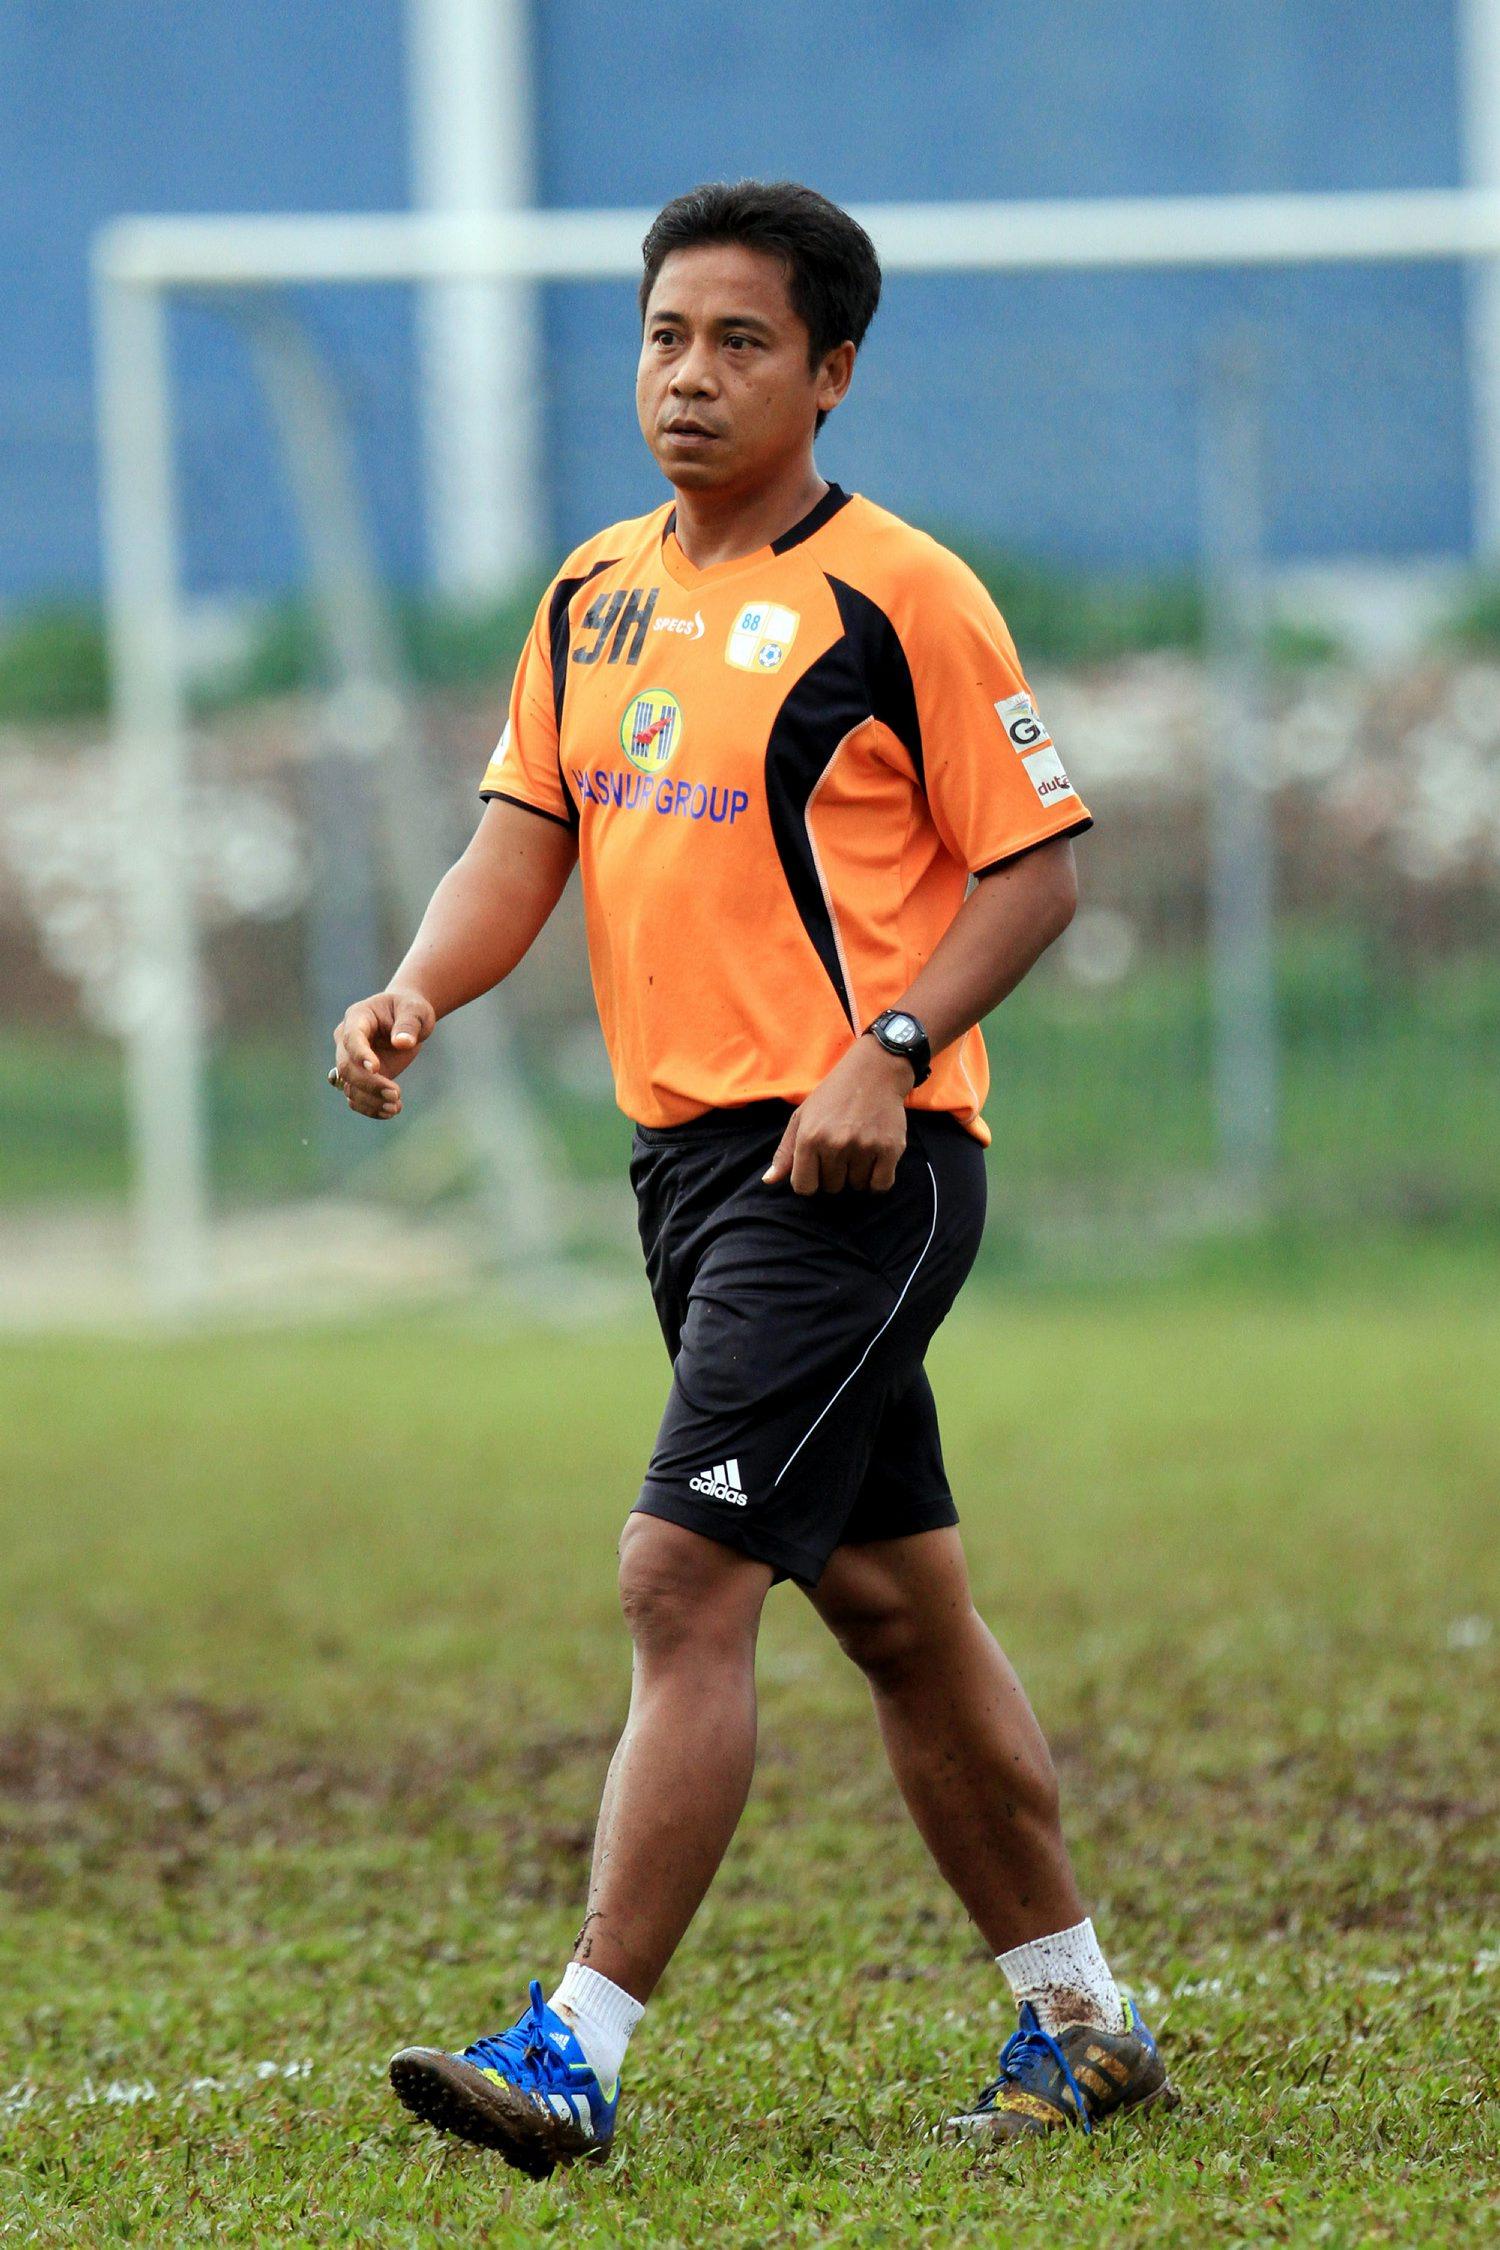 Asisten Pelatih Barito Putera, Yunan Helmi usai uji coba tanding di lapangan Bea Cukai Rawamangun, Jakarta Timur (14/4/2014). dalam pertandingan uji coba ini Barito Putera menang atas Union Makes Strength (UMS) dengan skor 4-0. (SUPERBALL/Feri Setiawan)